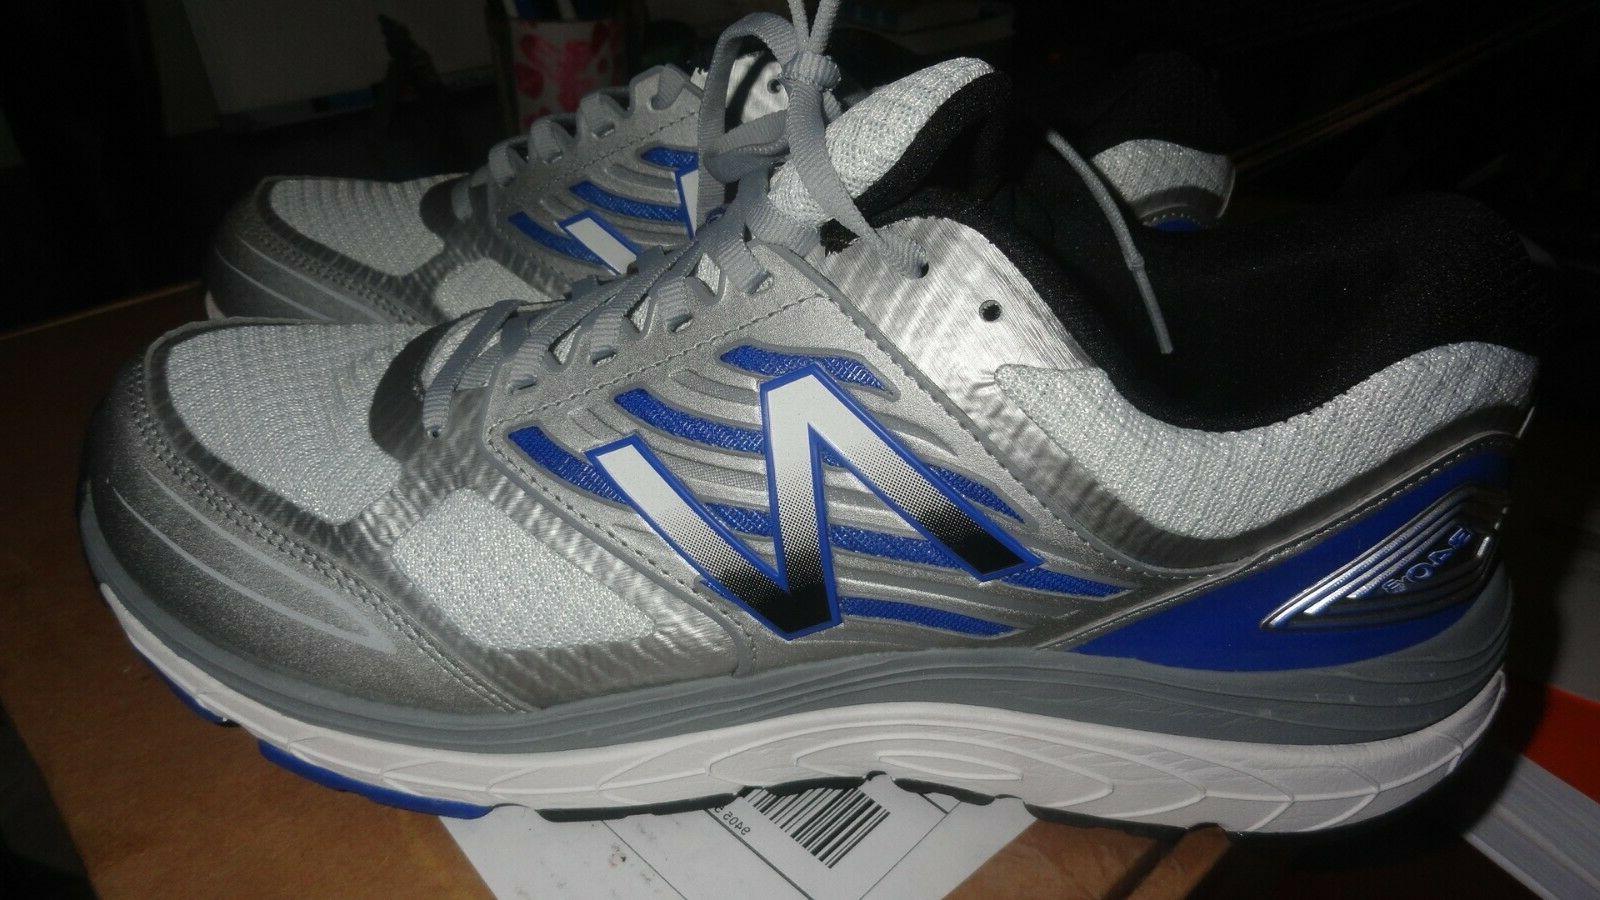 brand new men s 1340 running shoes